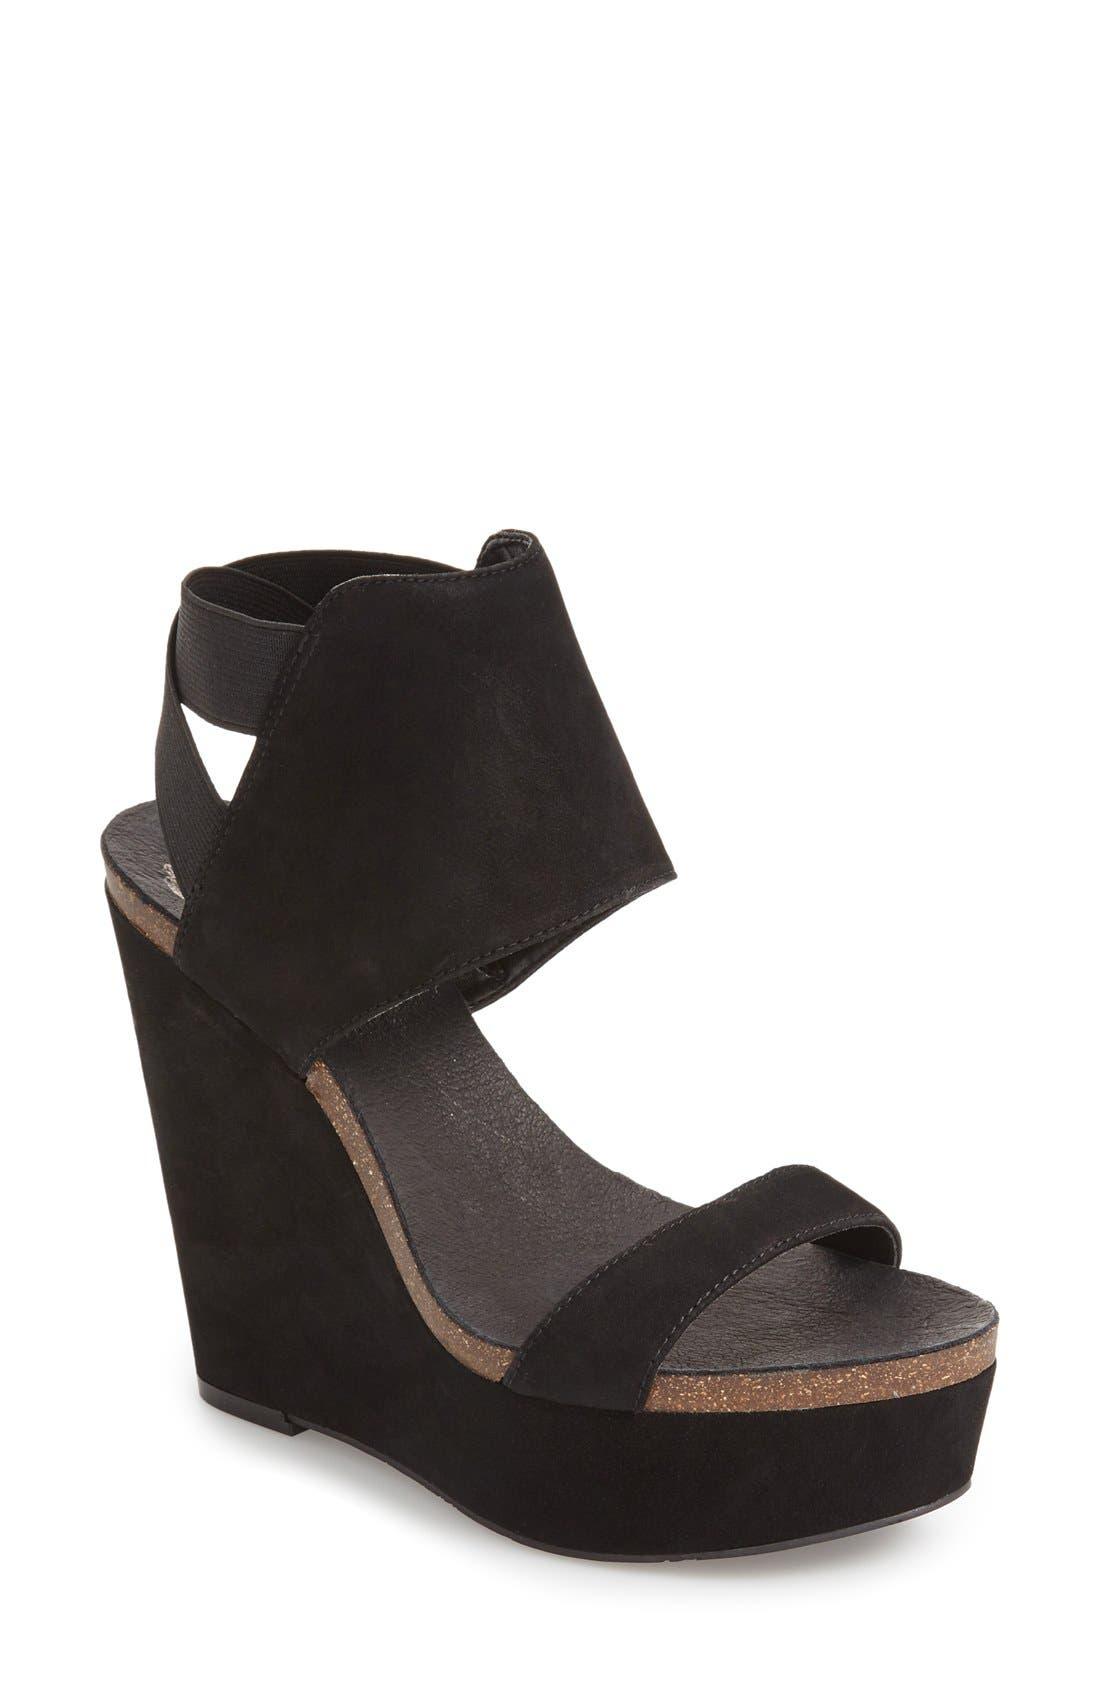 Kresta Platform Wedge Sandal,                             Main thumbnail 1, color,                             001